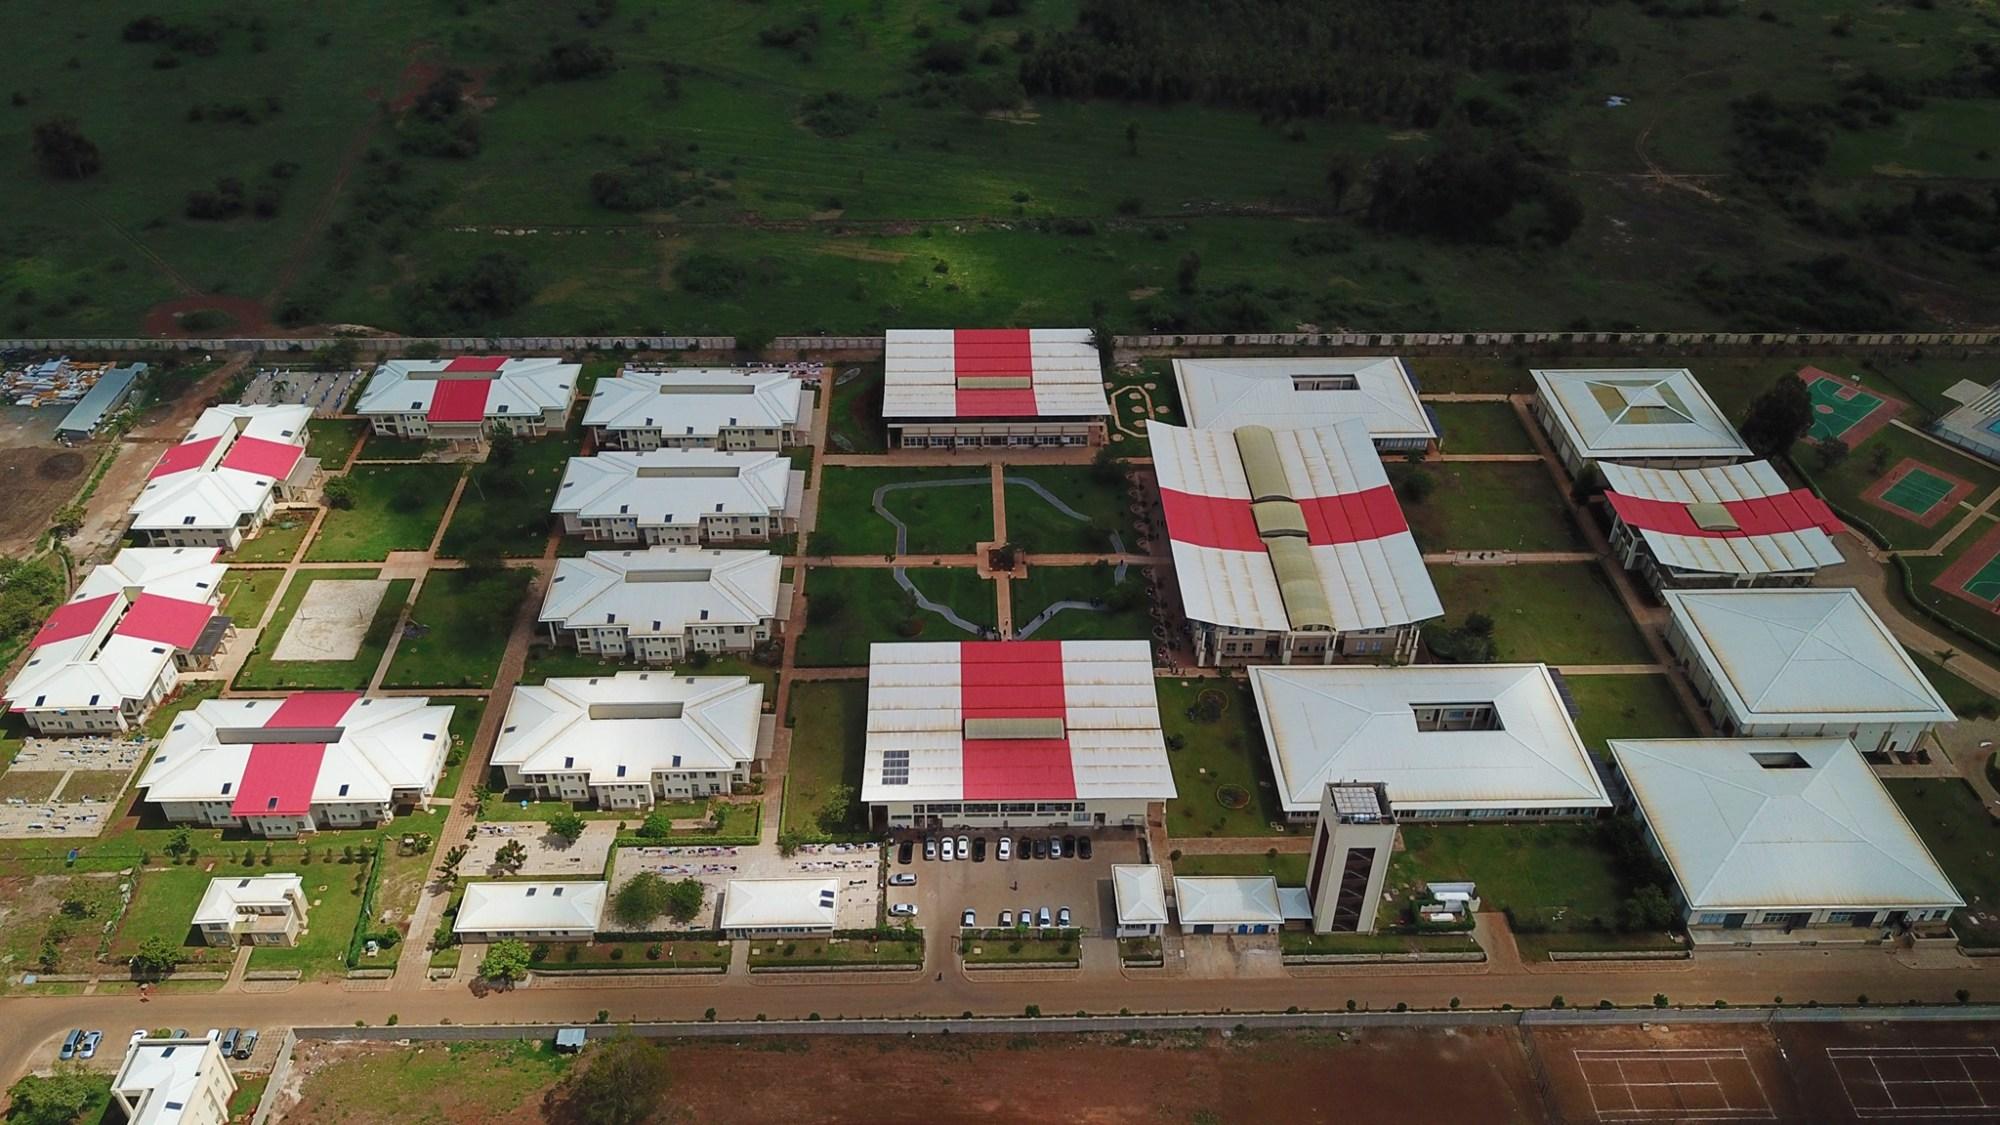 Mpesa Foundation Academy Aerial view photos